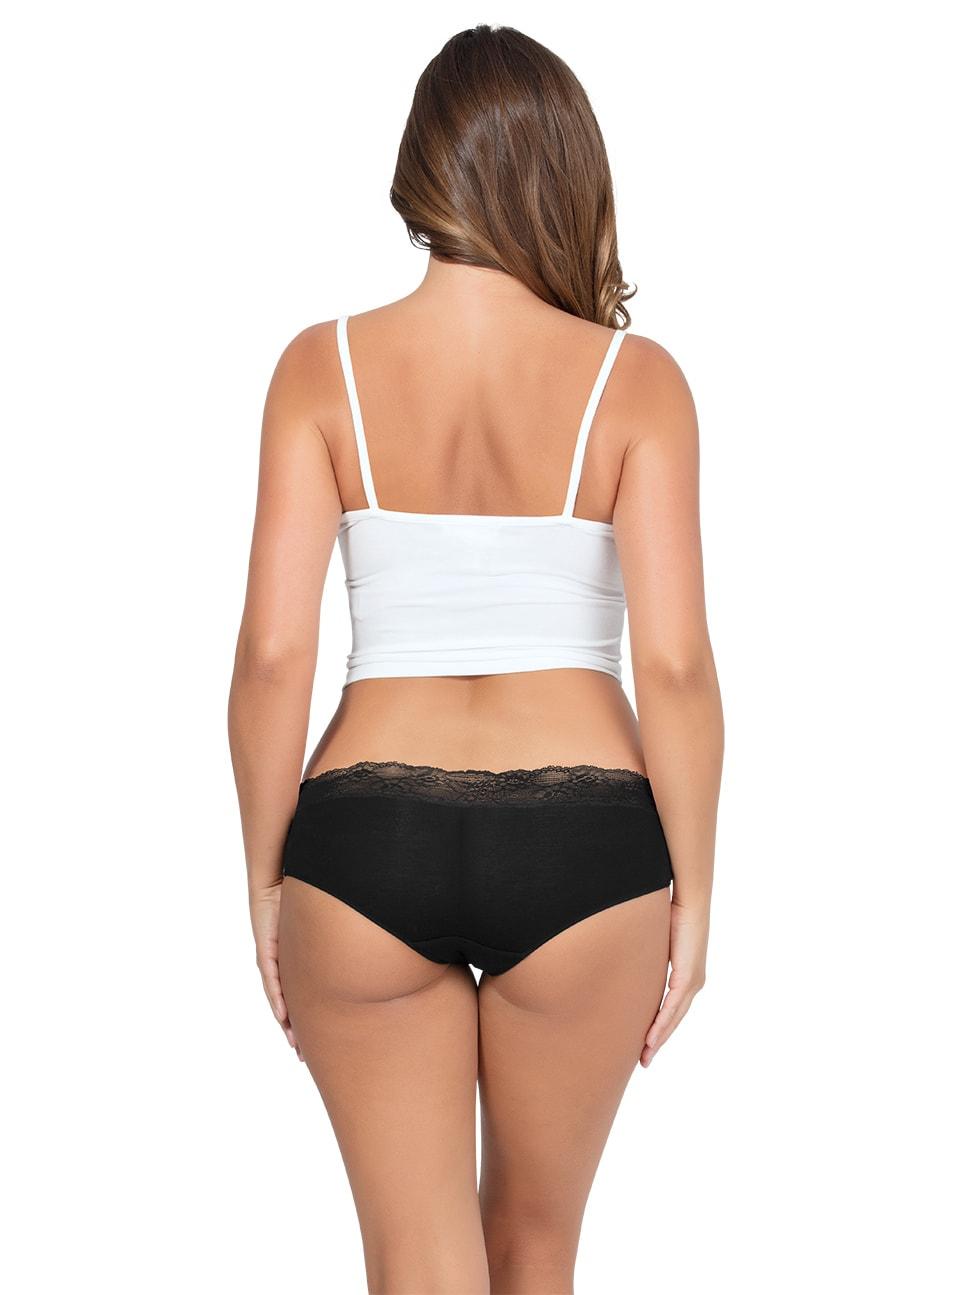 PARFAIT ParfaitPanty SoEssential HipsterPP503 Black Back copy - Parfait Panty So Essential Hipster - Black - PP503